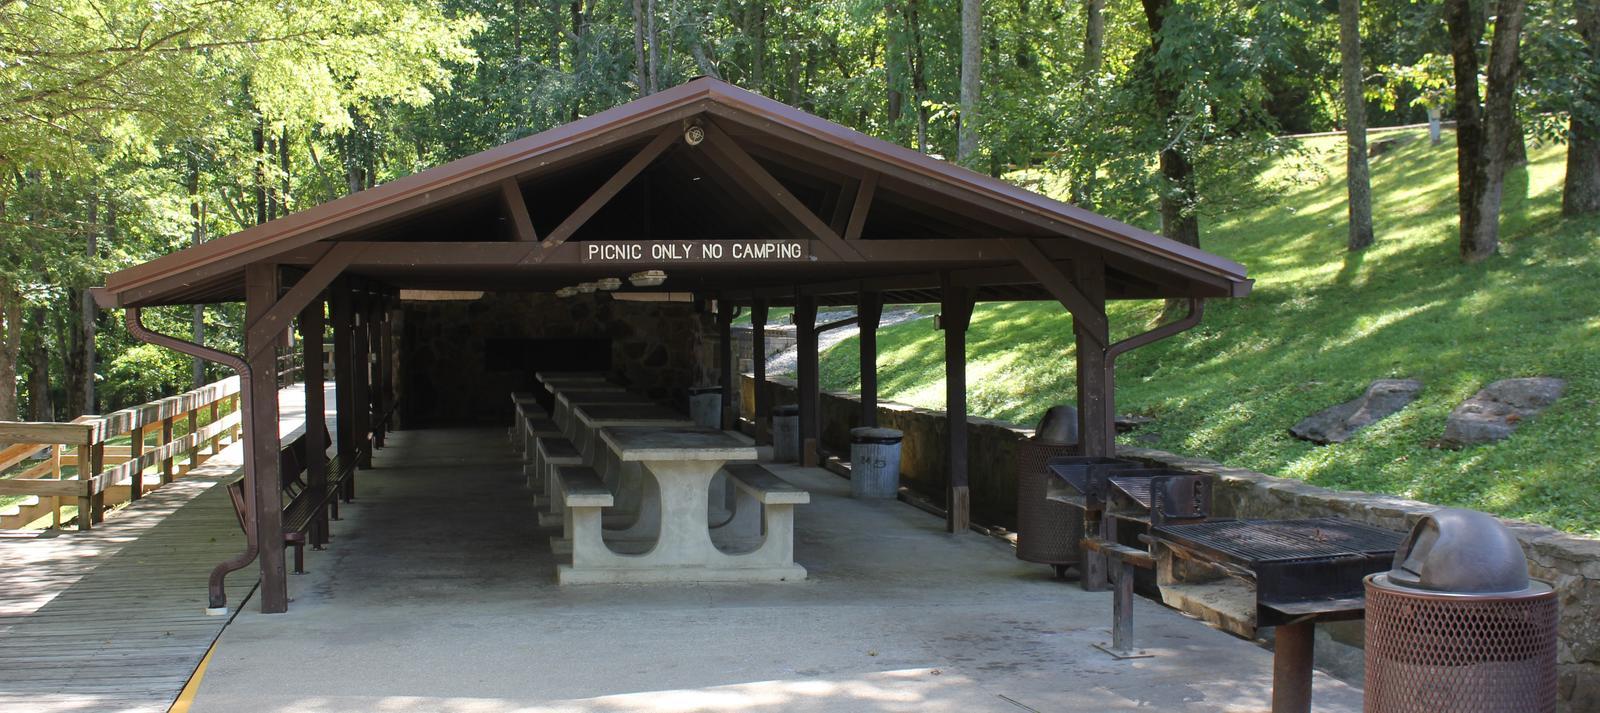 Group Picnic Shelter Group Picnic Shelter